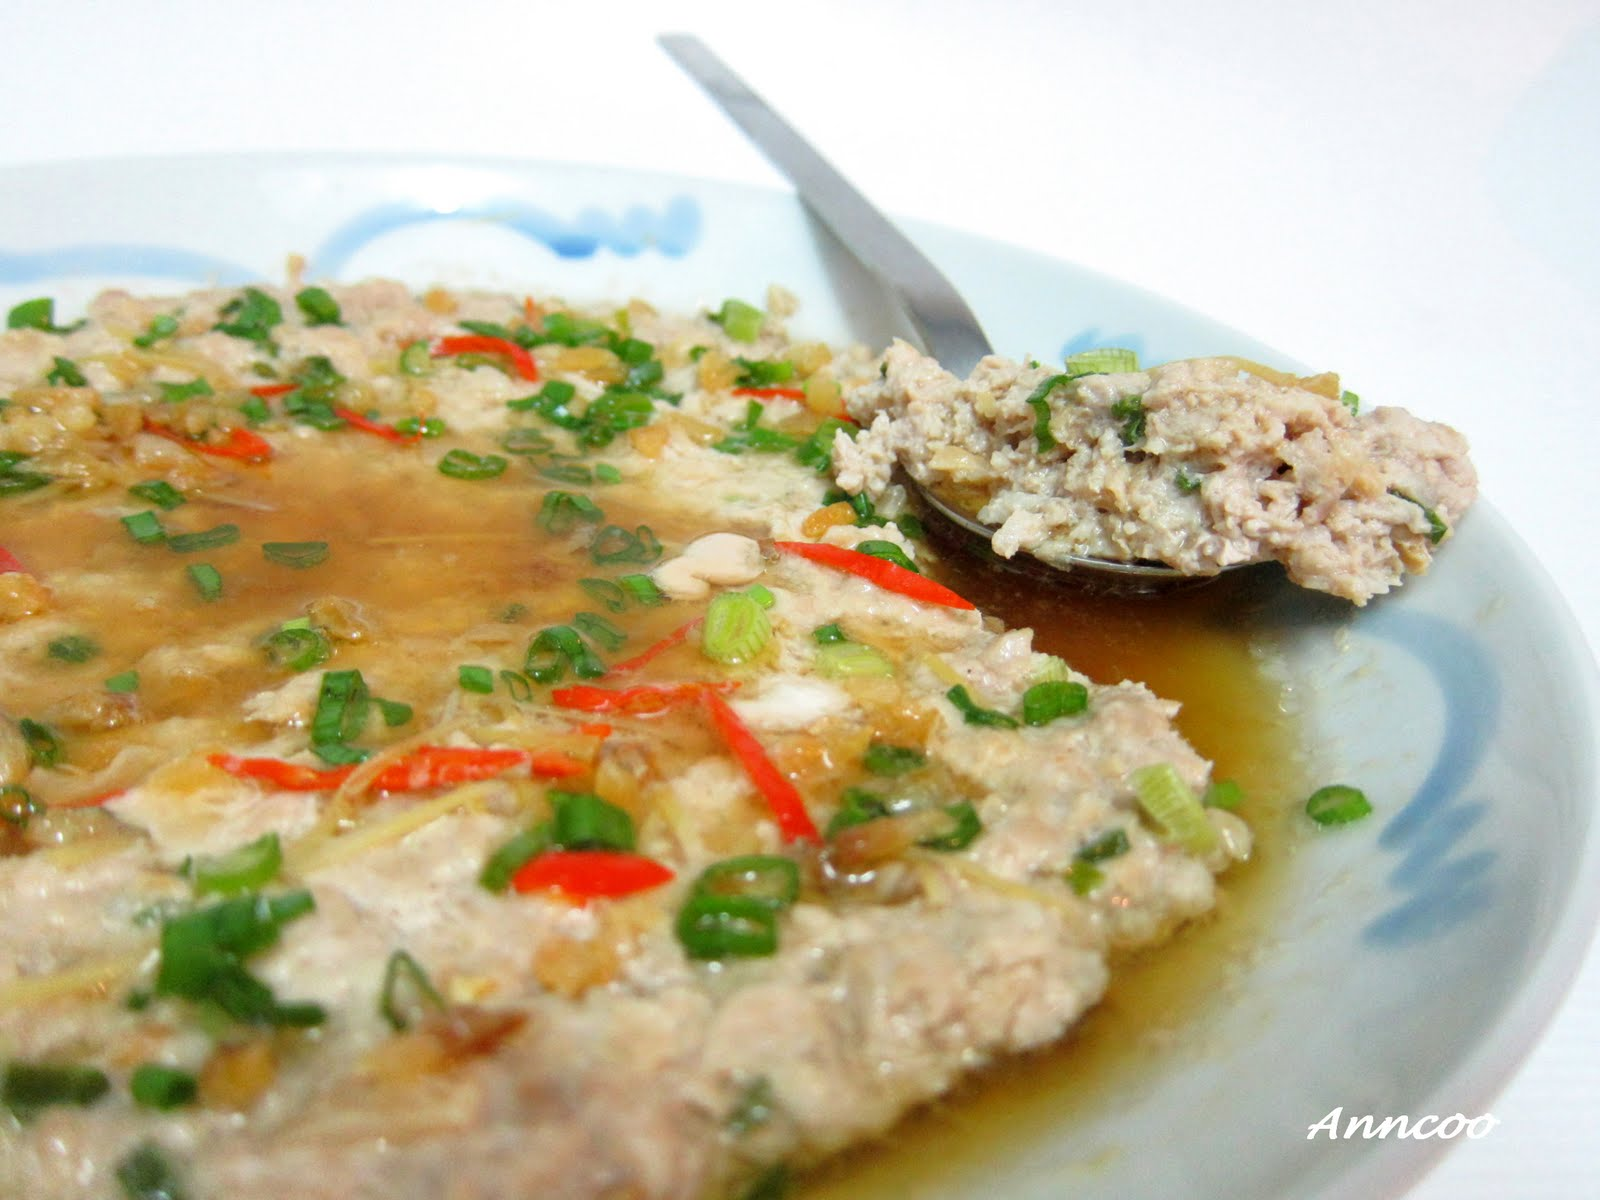 ... meat recipe steamed tofu with ground pork steamed minced pork and tofu